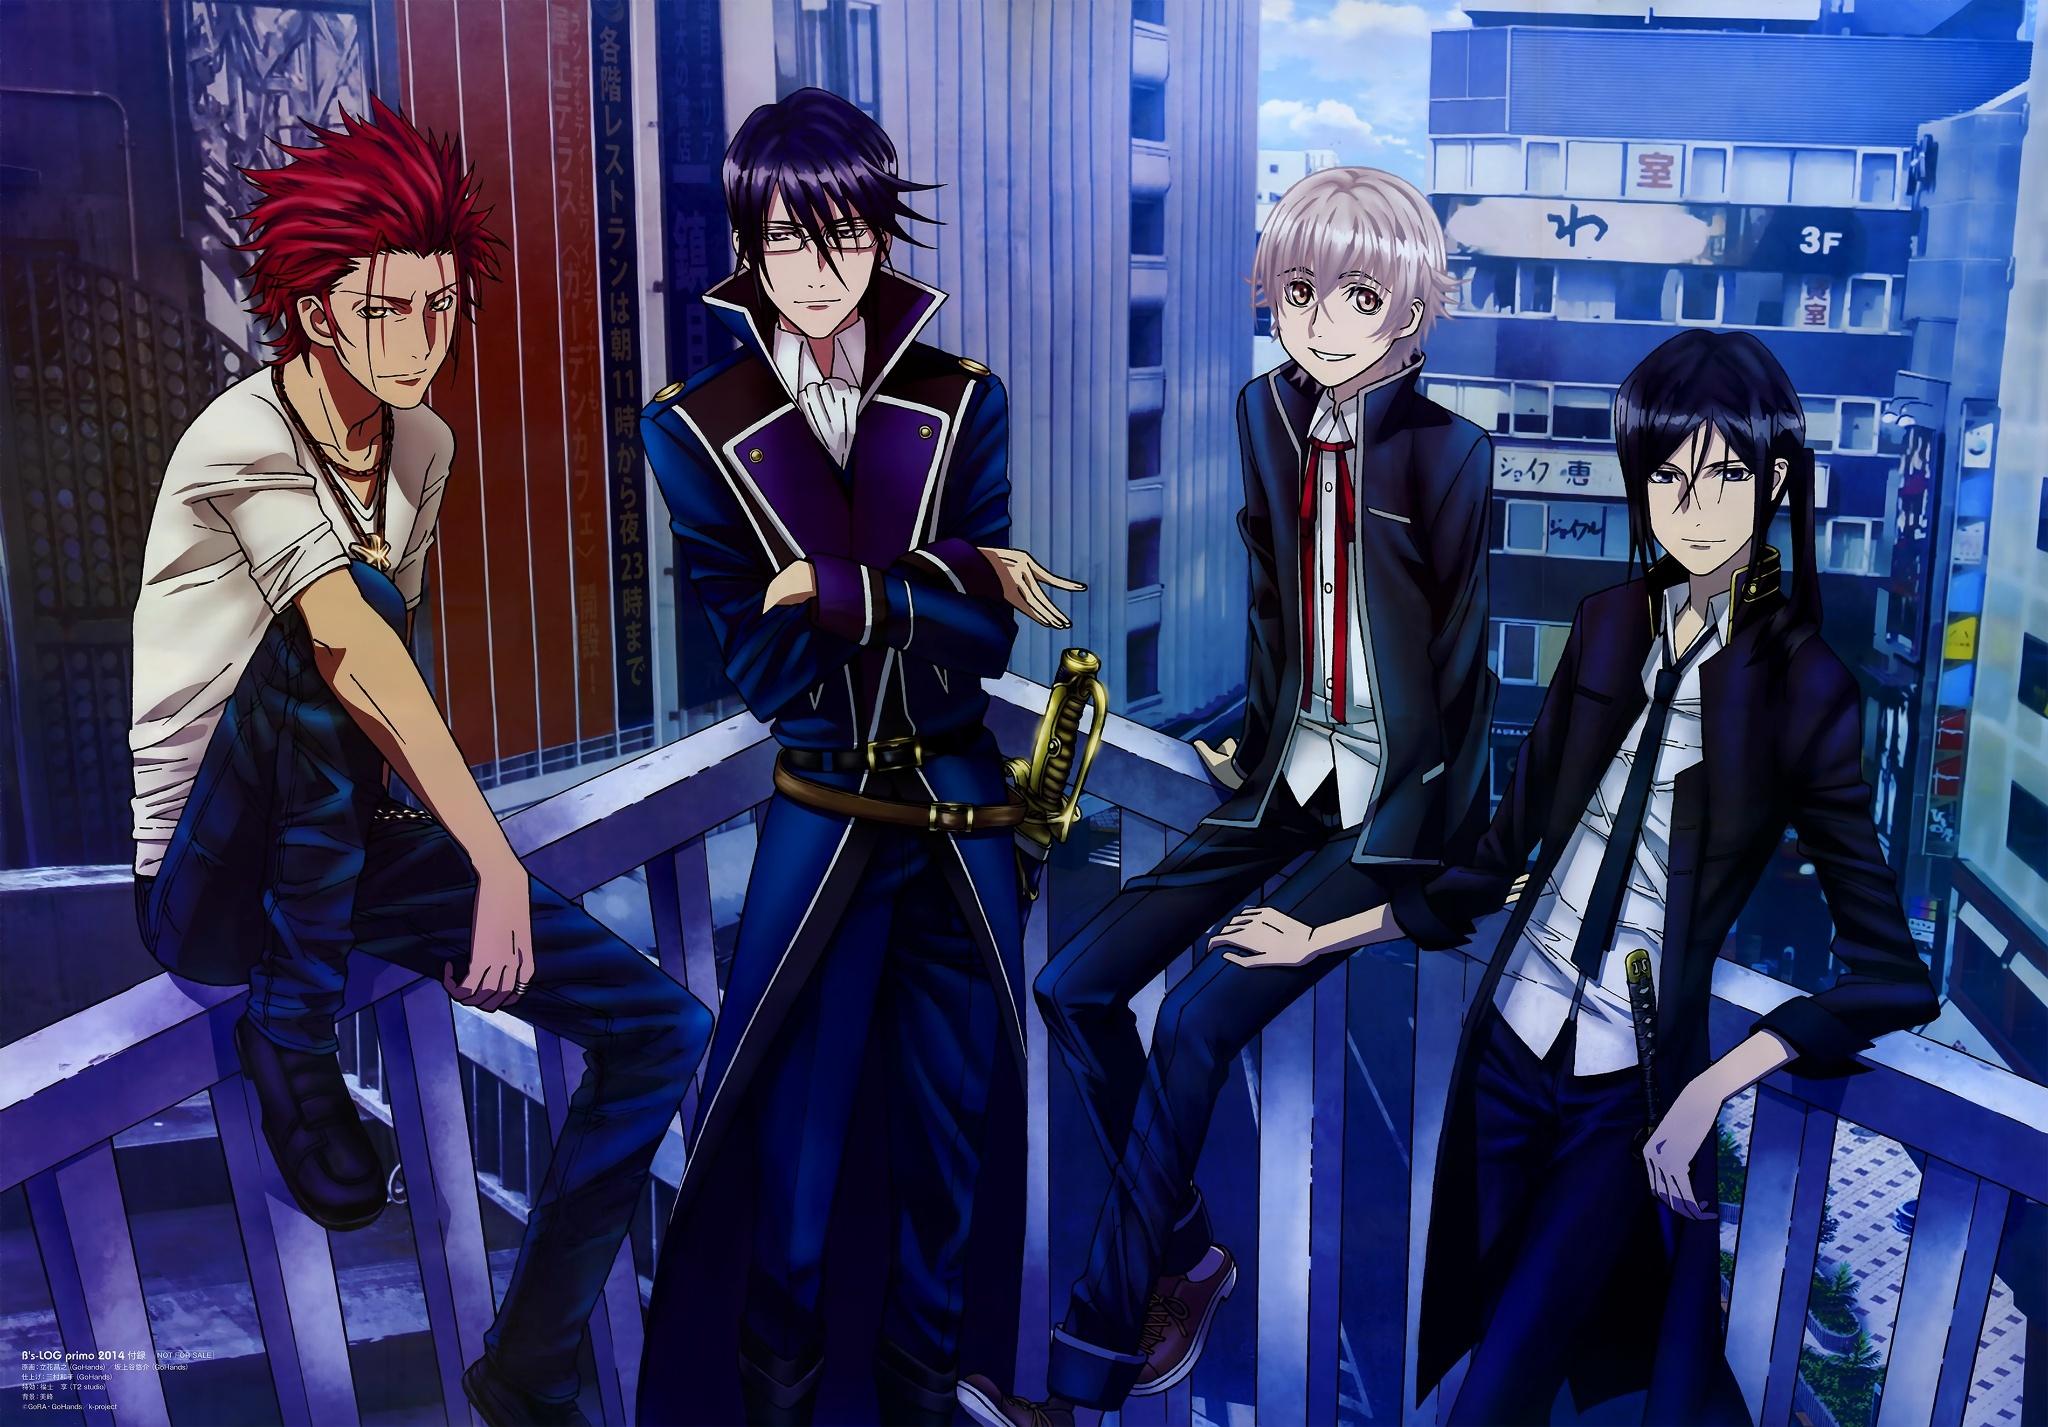 Mikoto,Reisi,Yashiro And Kuroh Full HD Wallpaper And